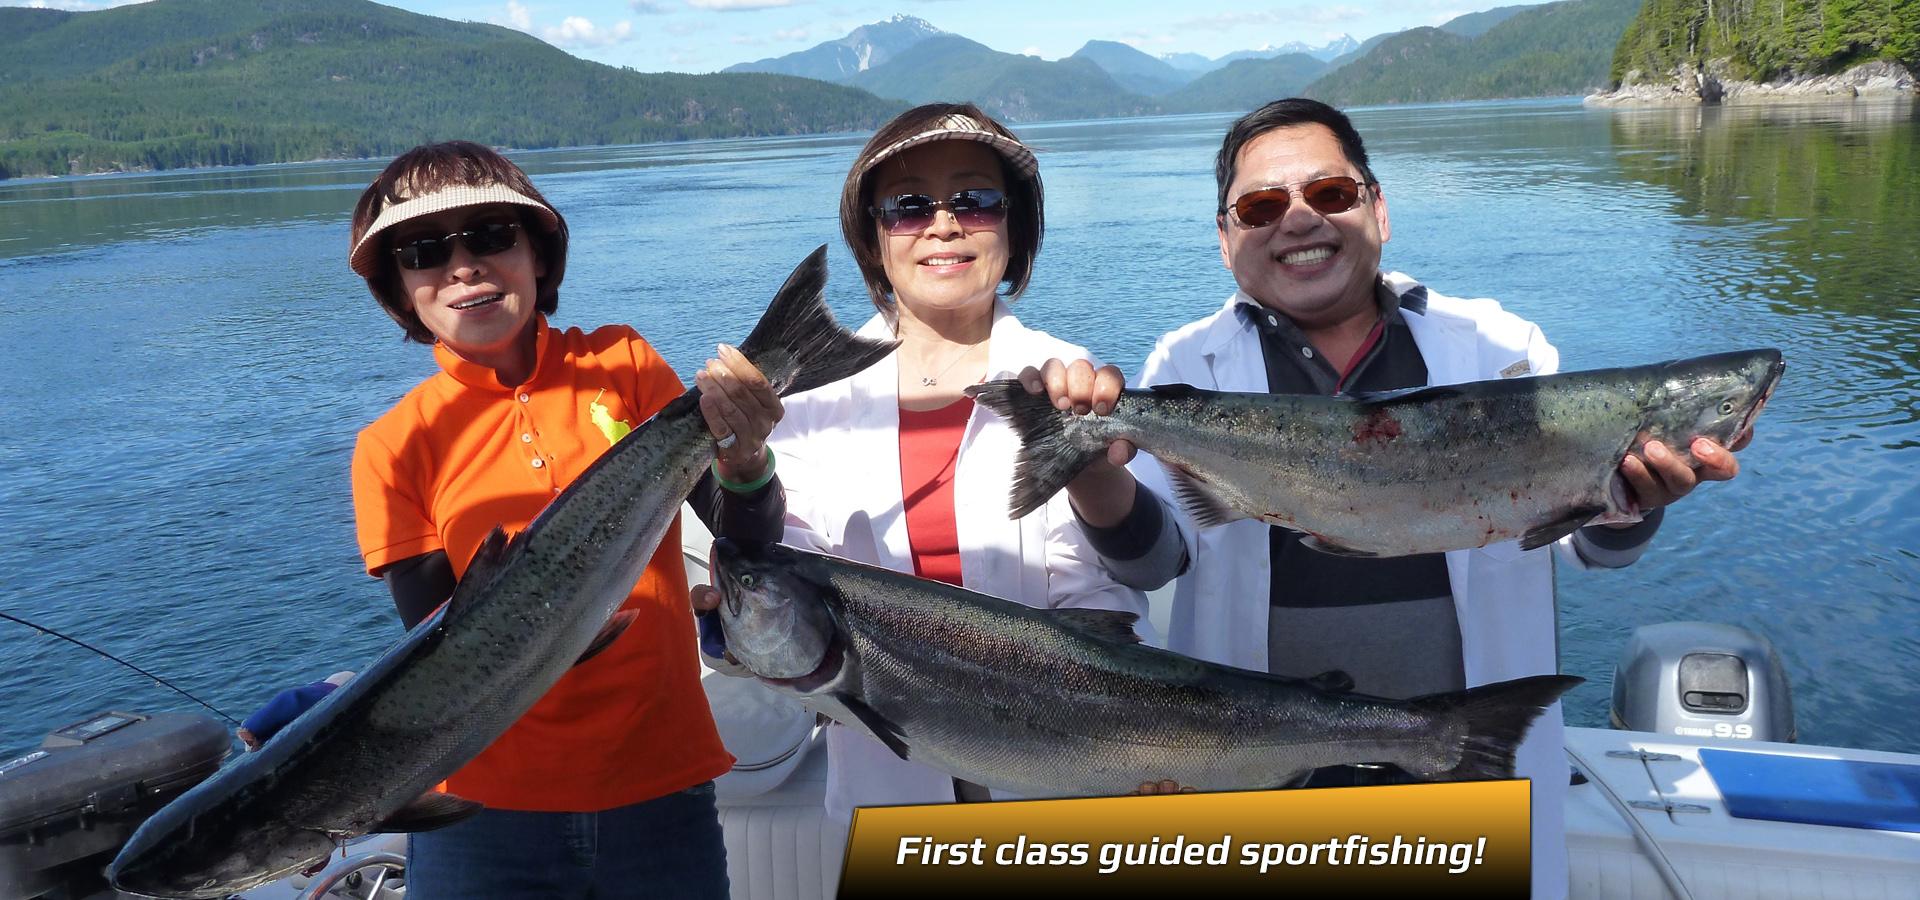 profish first class salmon fishing